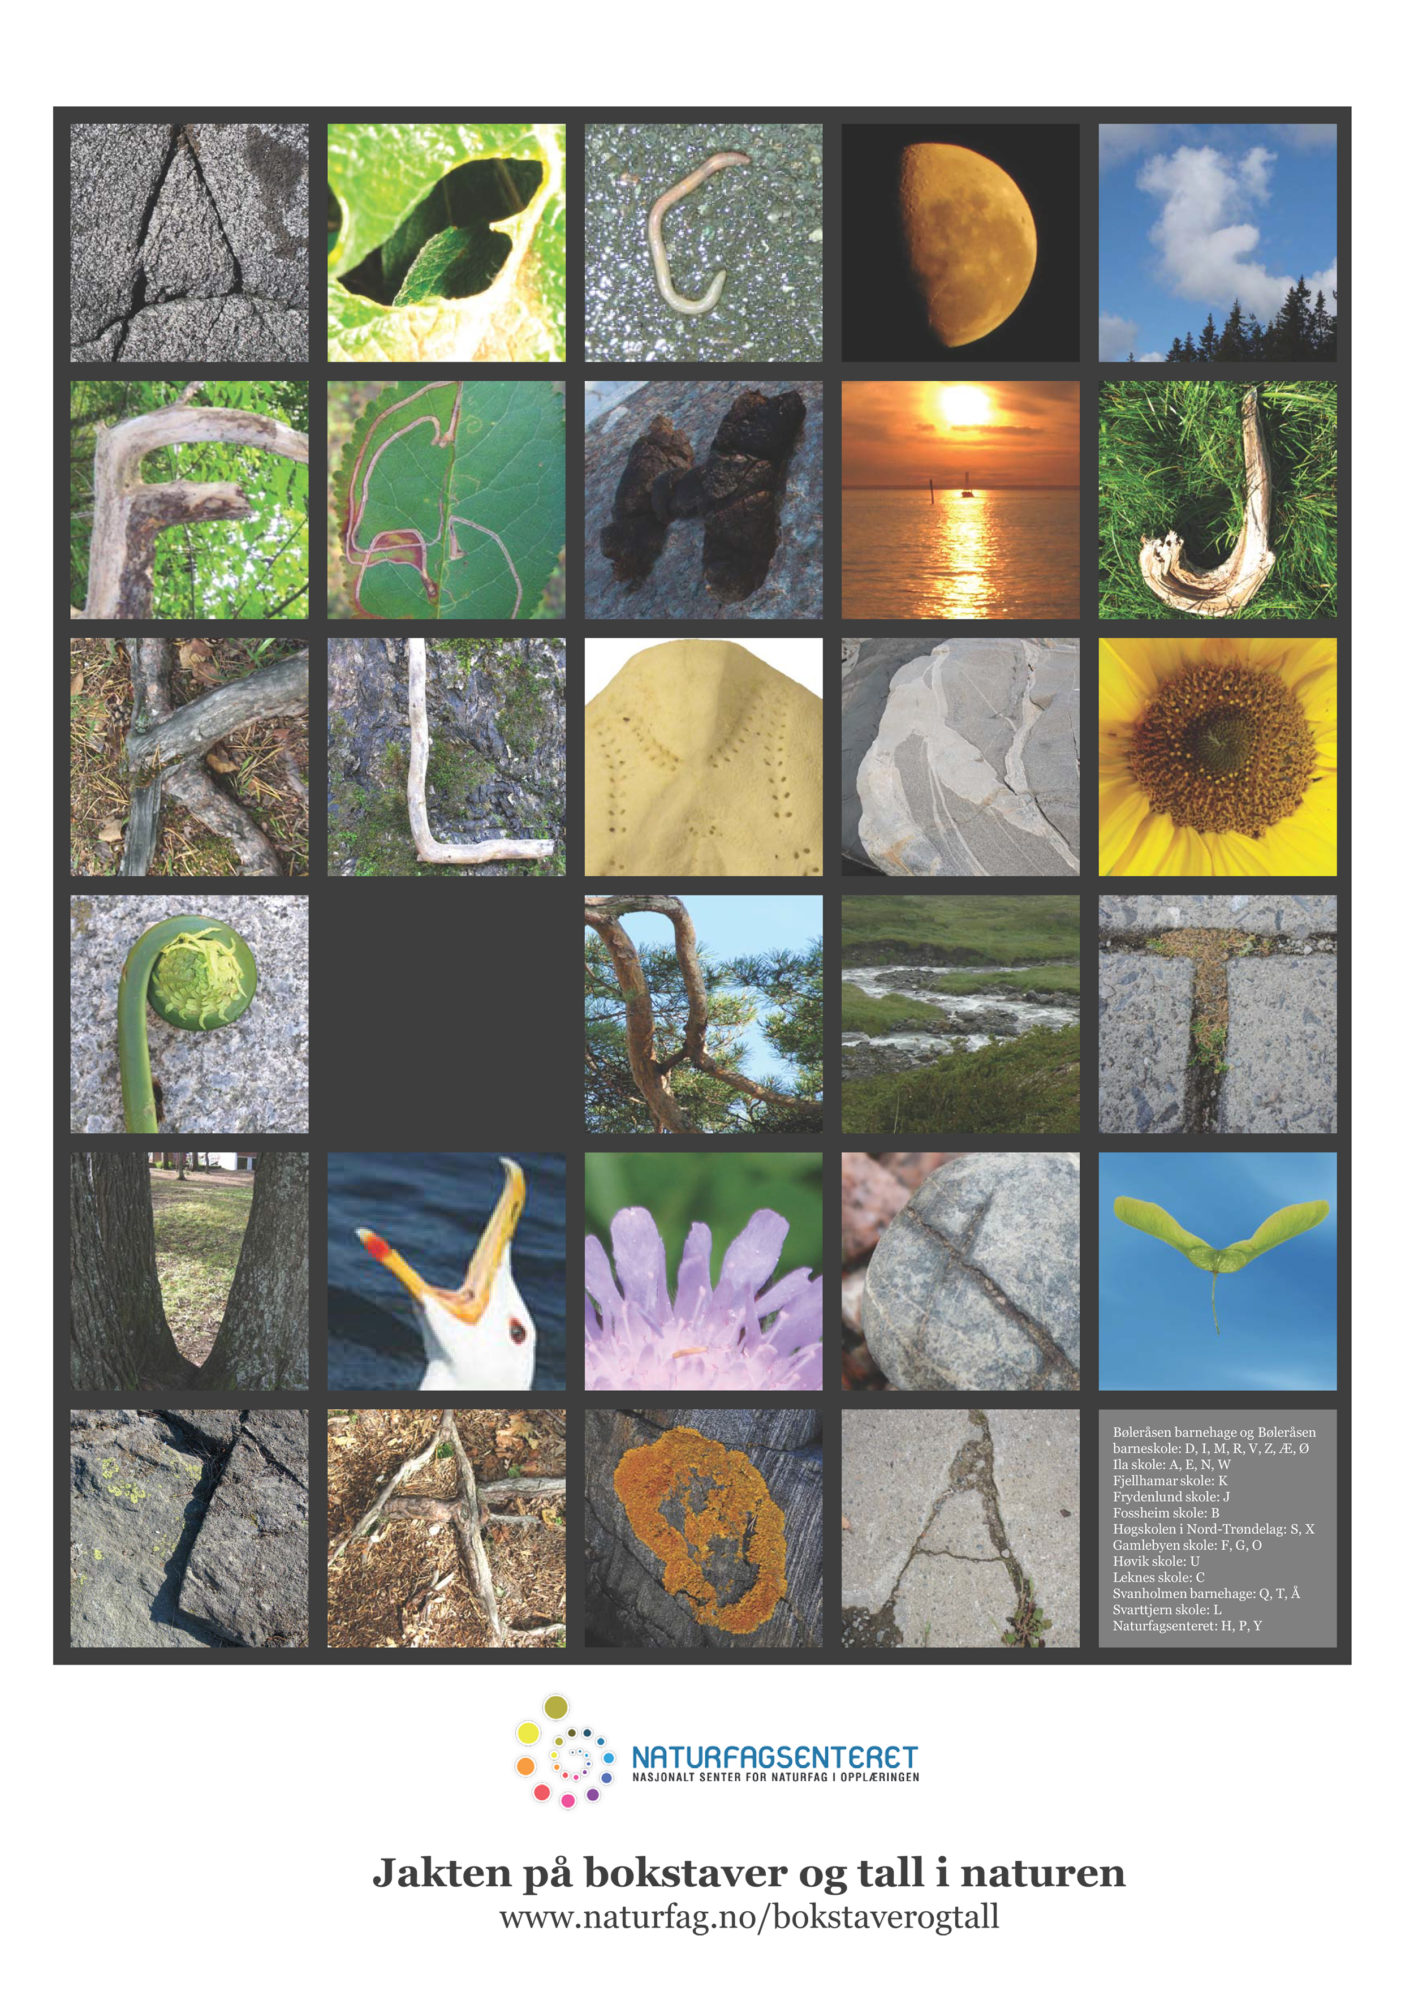 Plakat fra Naturfagsenteret om jagt på bokstaver og tall i naturen